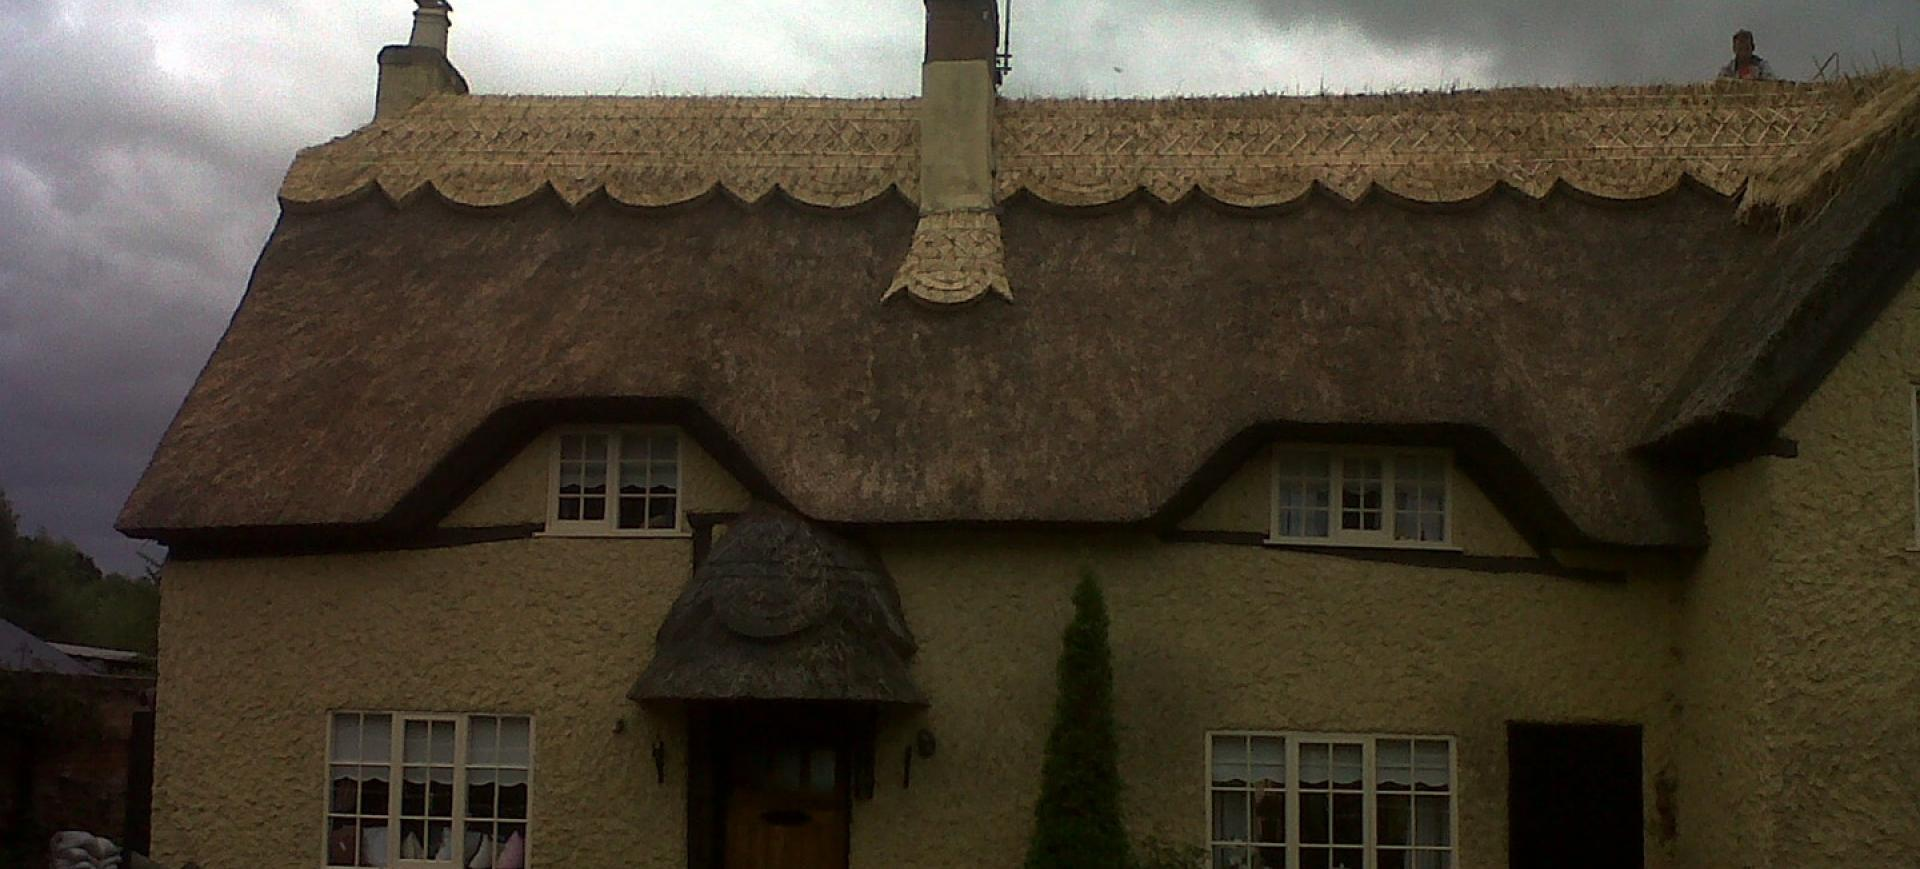 Leicestershire 14.jpg